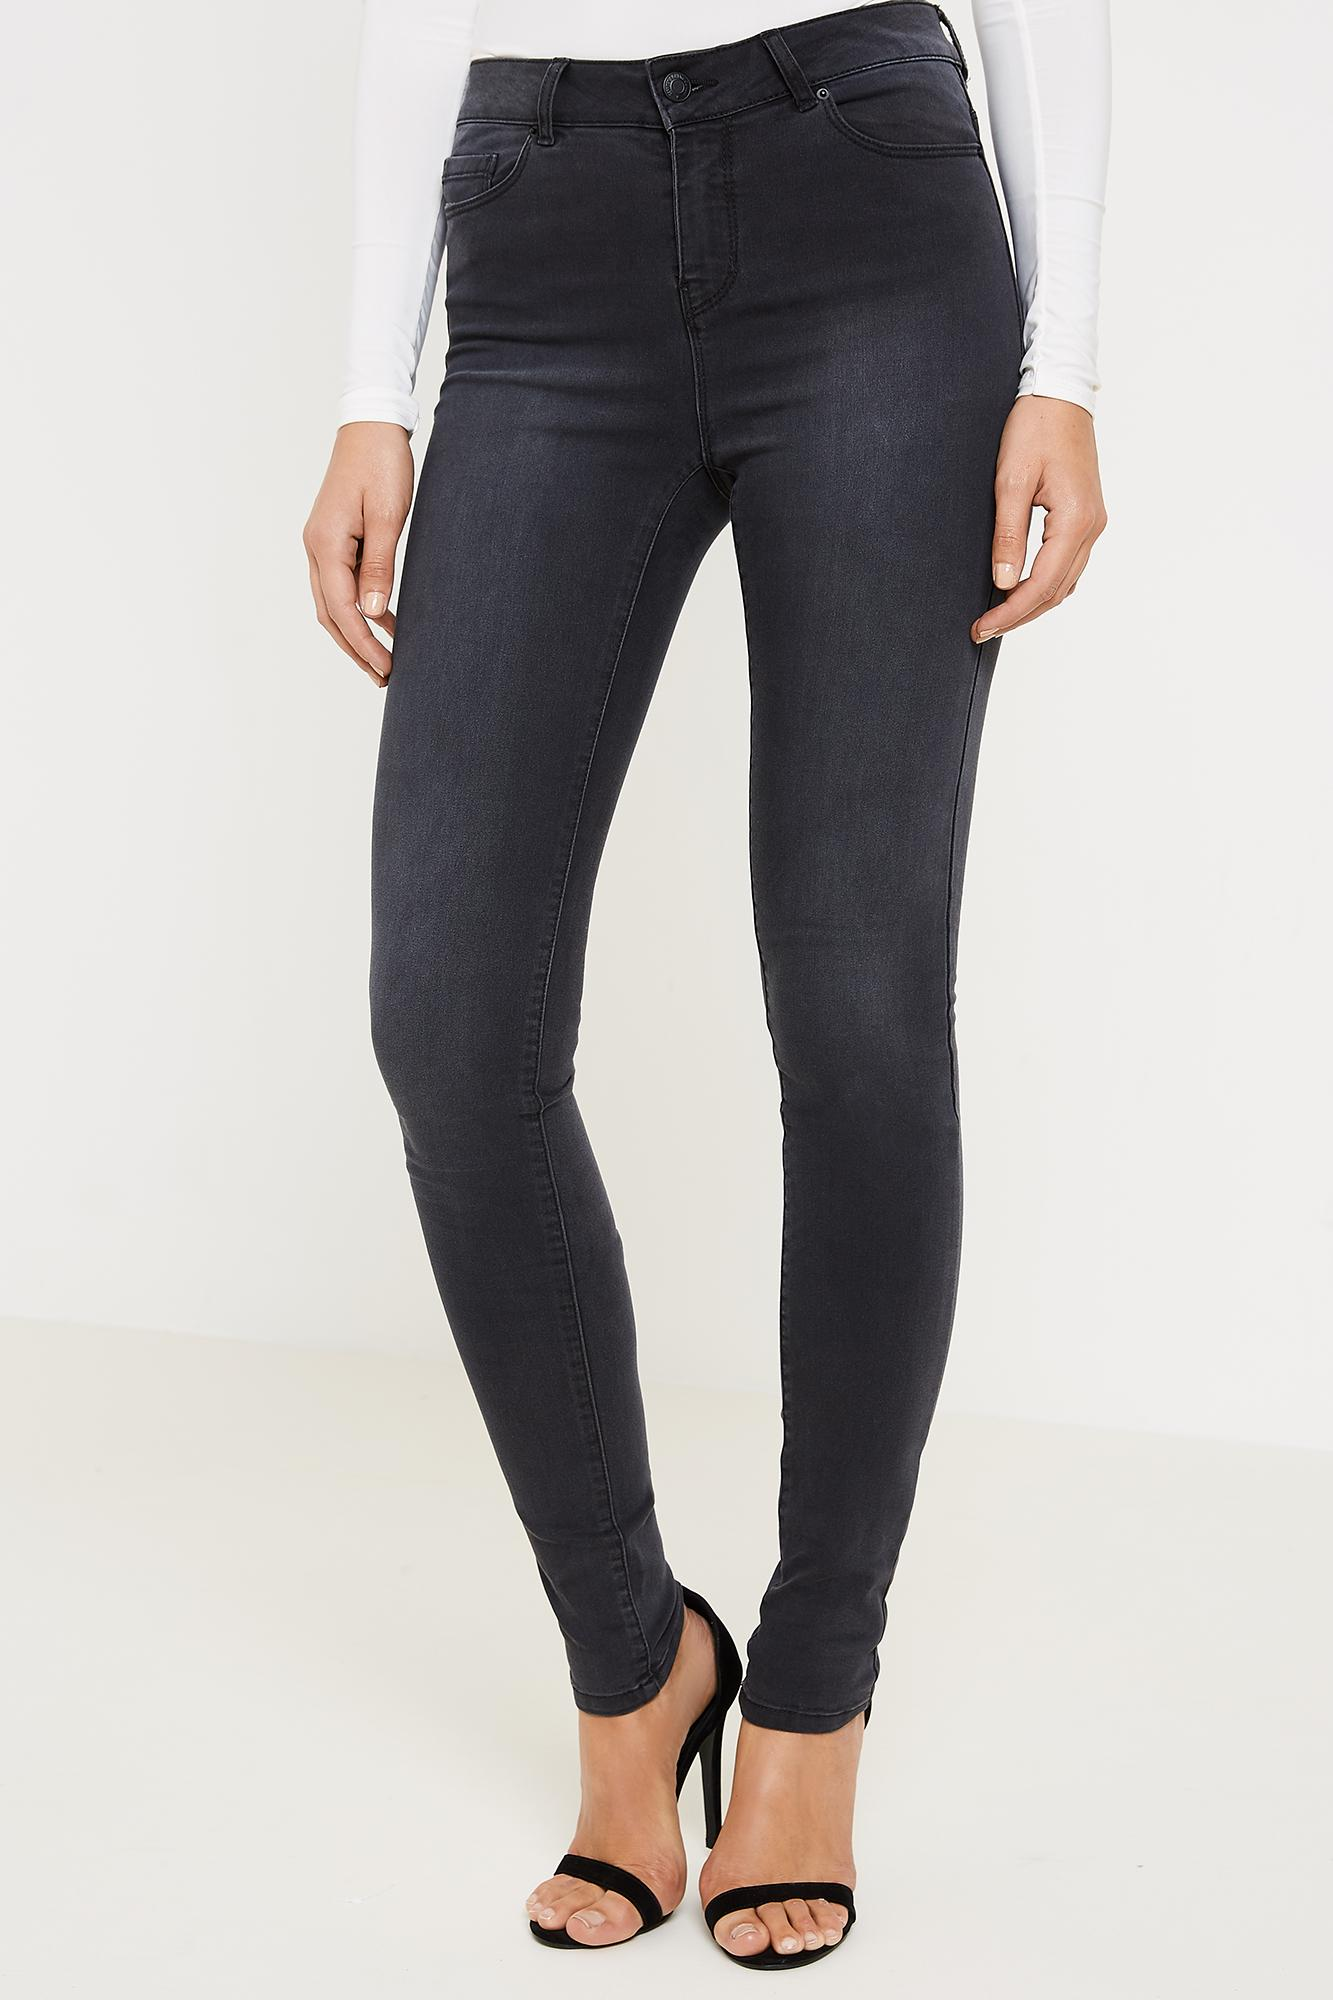 vero moda seven smooth skinny jeans. Black Bedroom Furniture Sets. Home Design Ideas